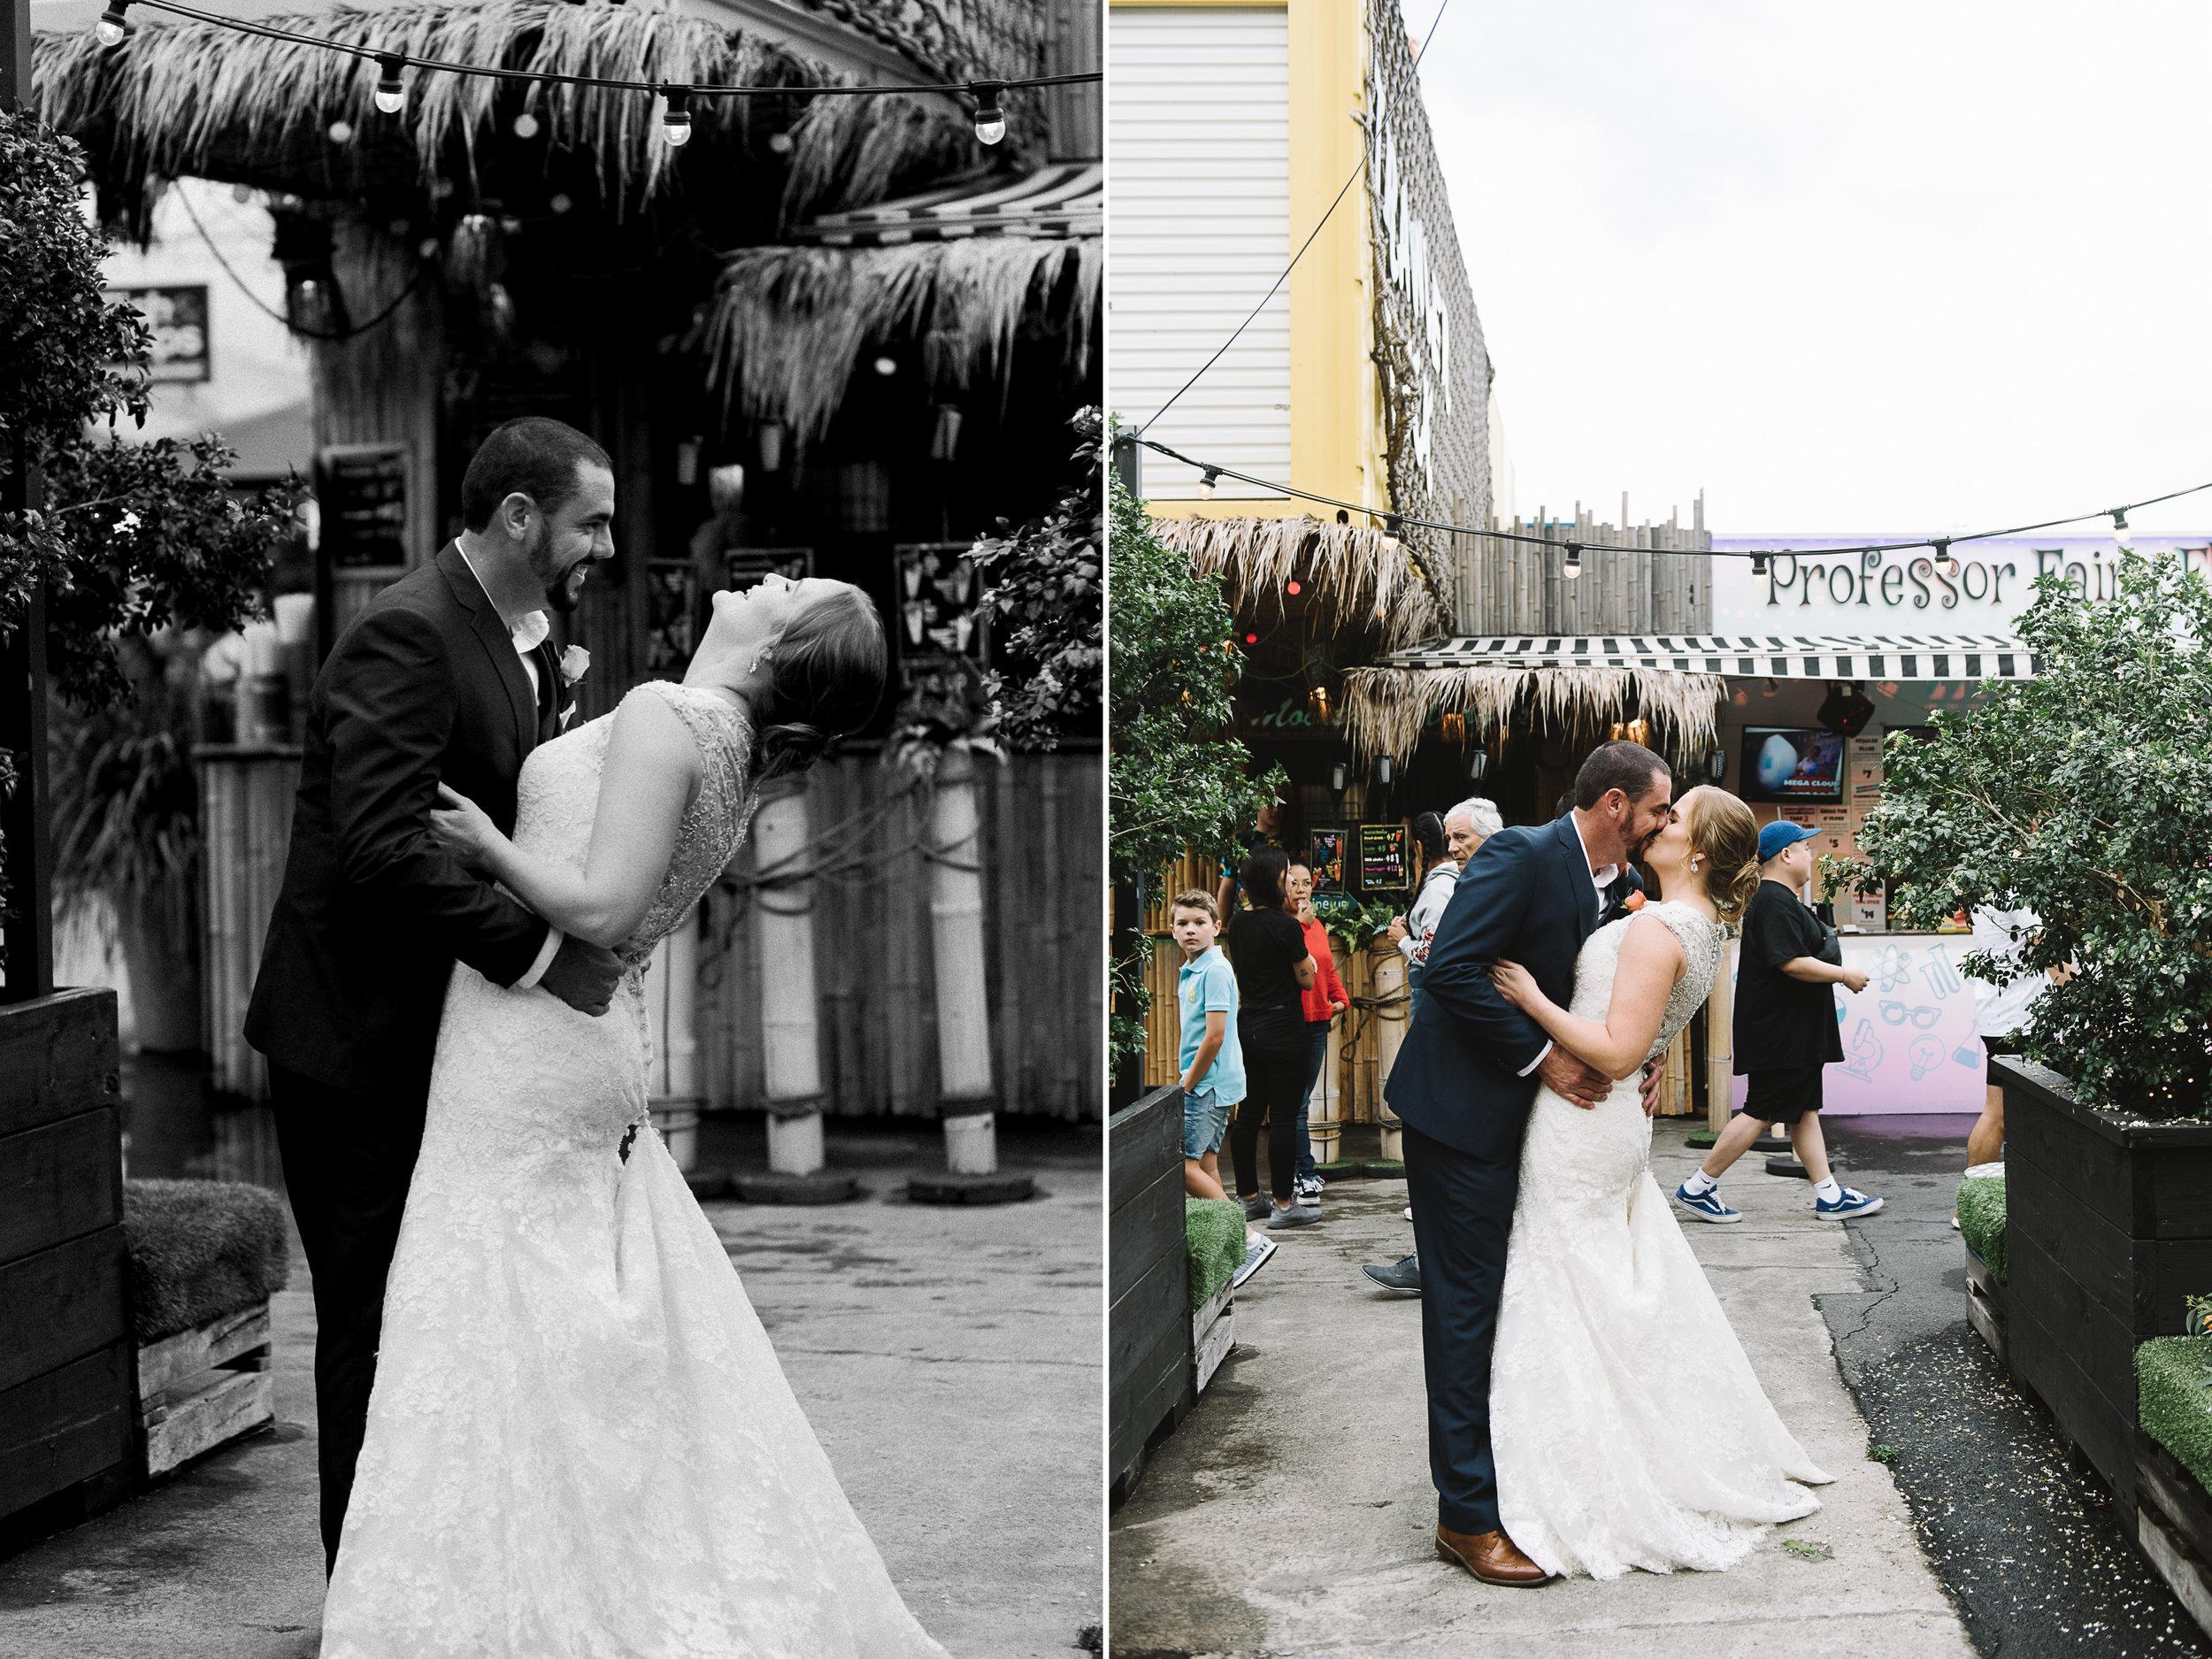 Eat-Street-Market-Wedding-3.jpg